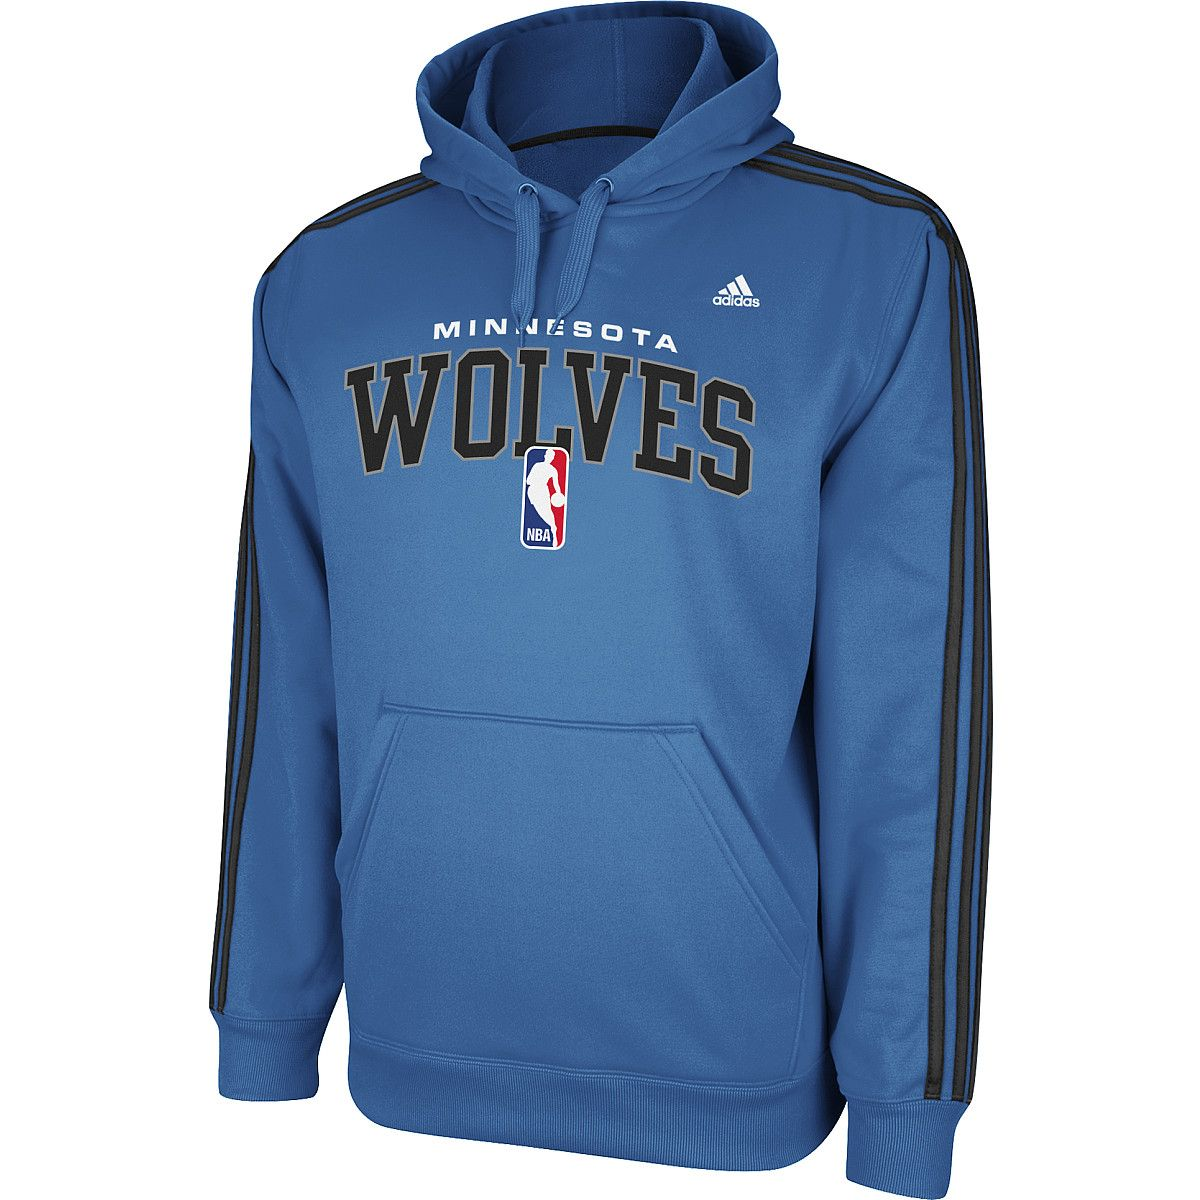 sale retailer 357f3 55ecb Adidas Minnesota Timberwolves 3-Stripe Hoodie /// $54.95 ...